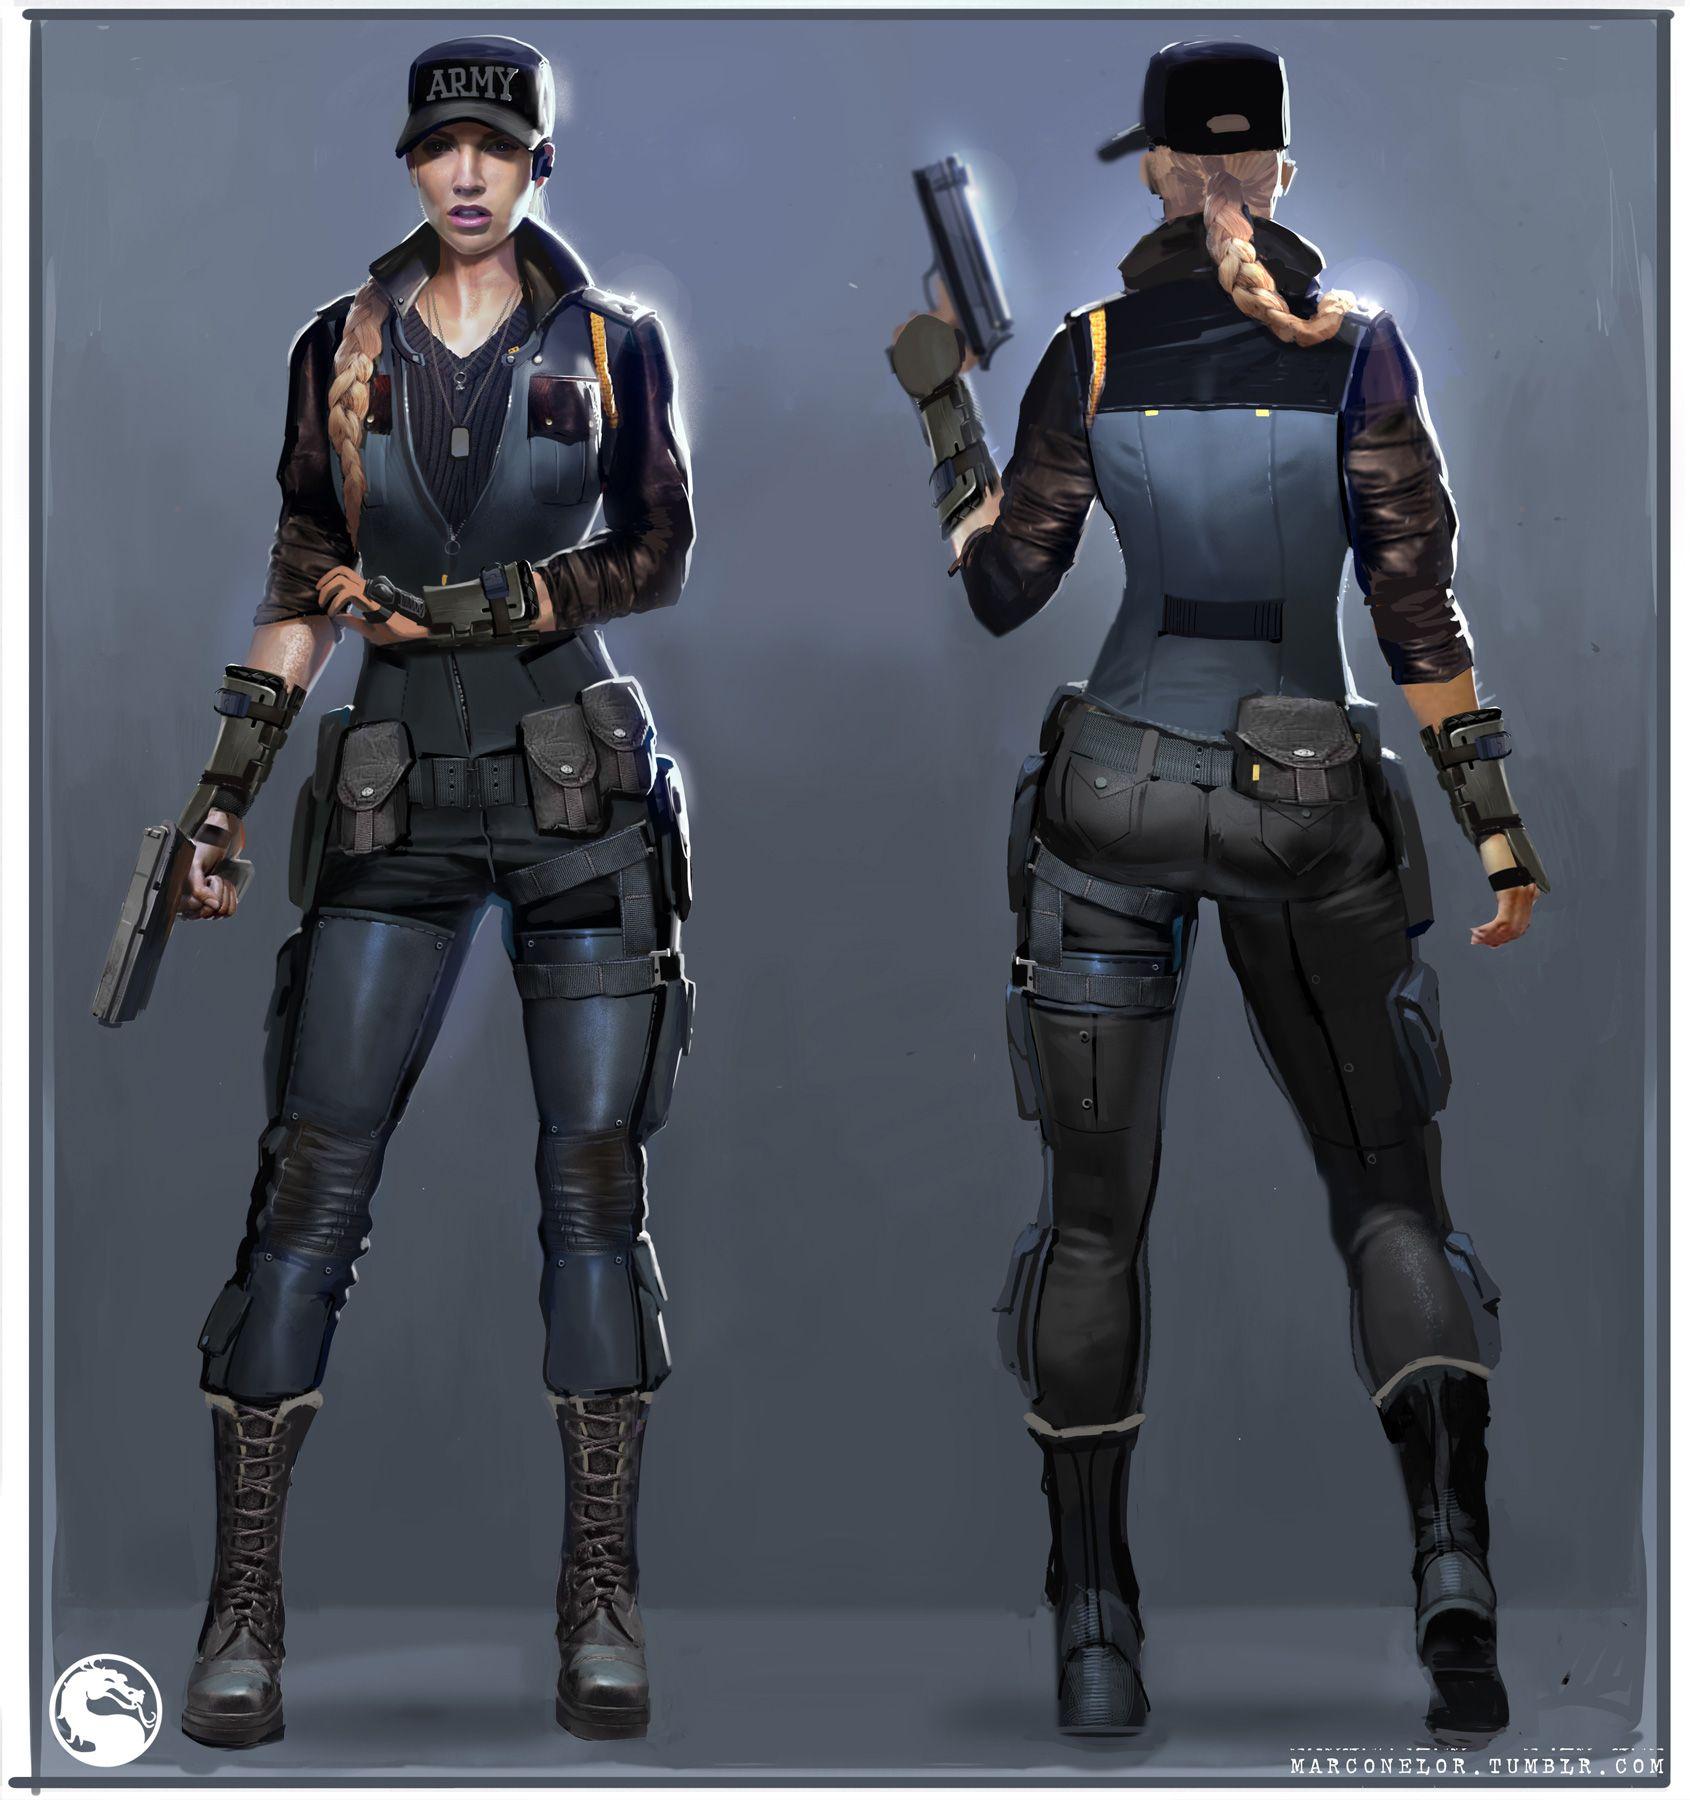 Character Design Mortal Kombat : Mortal kombat mkx concept art mn sonya design